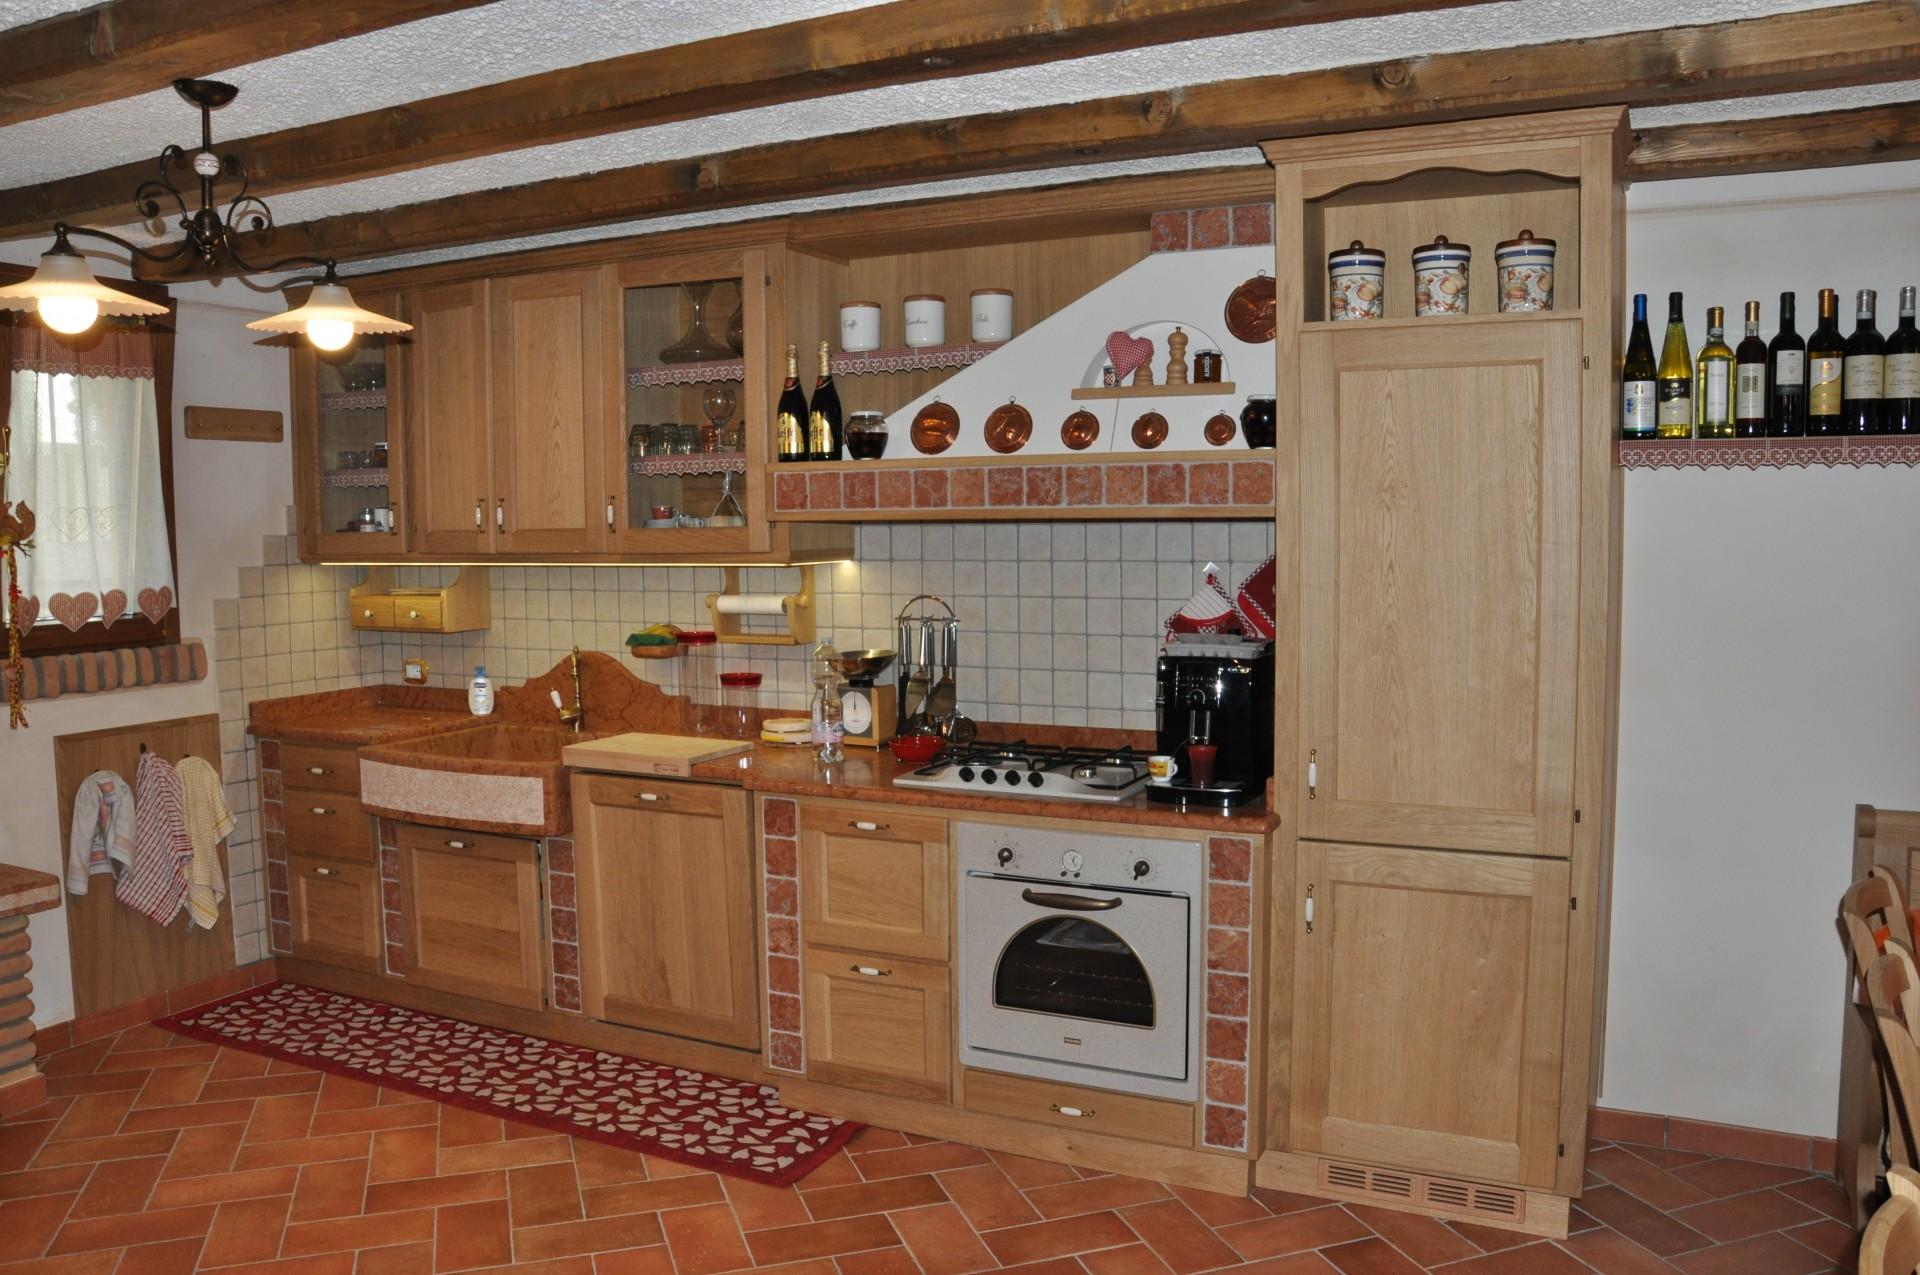 Cucina rustica con isola wr67 regardsdefemmes - Cucina country in muratura ...